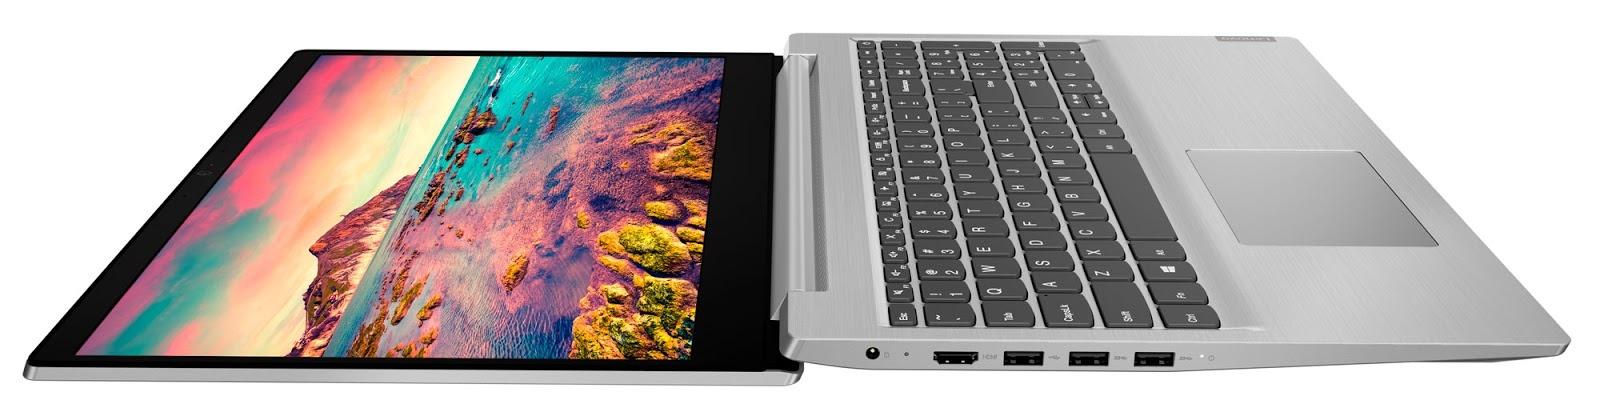 Фото 3. Ноутбук Lenovo ideapad S145-15AST (81N300E9RE)